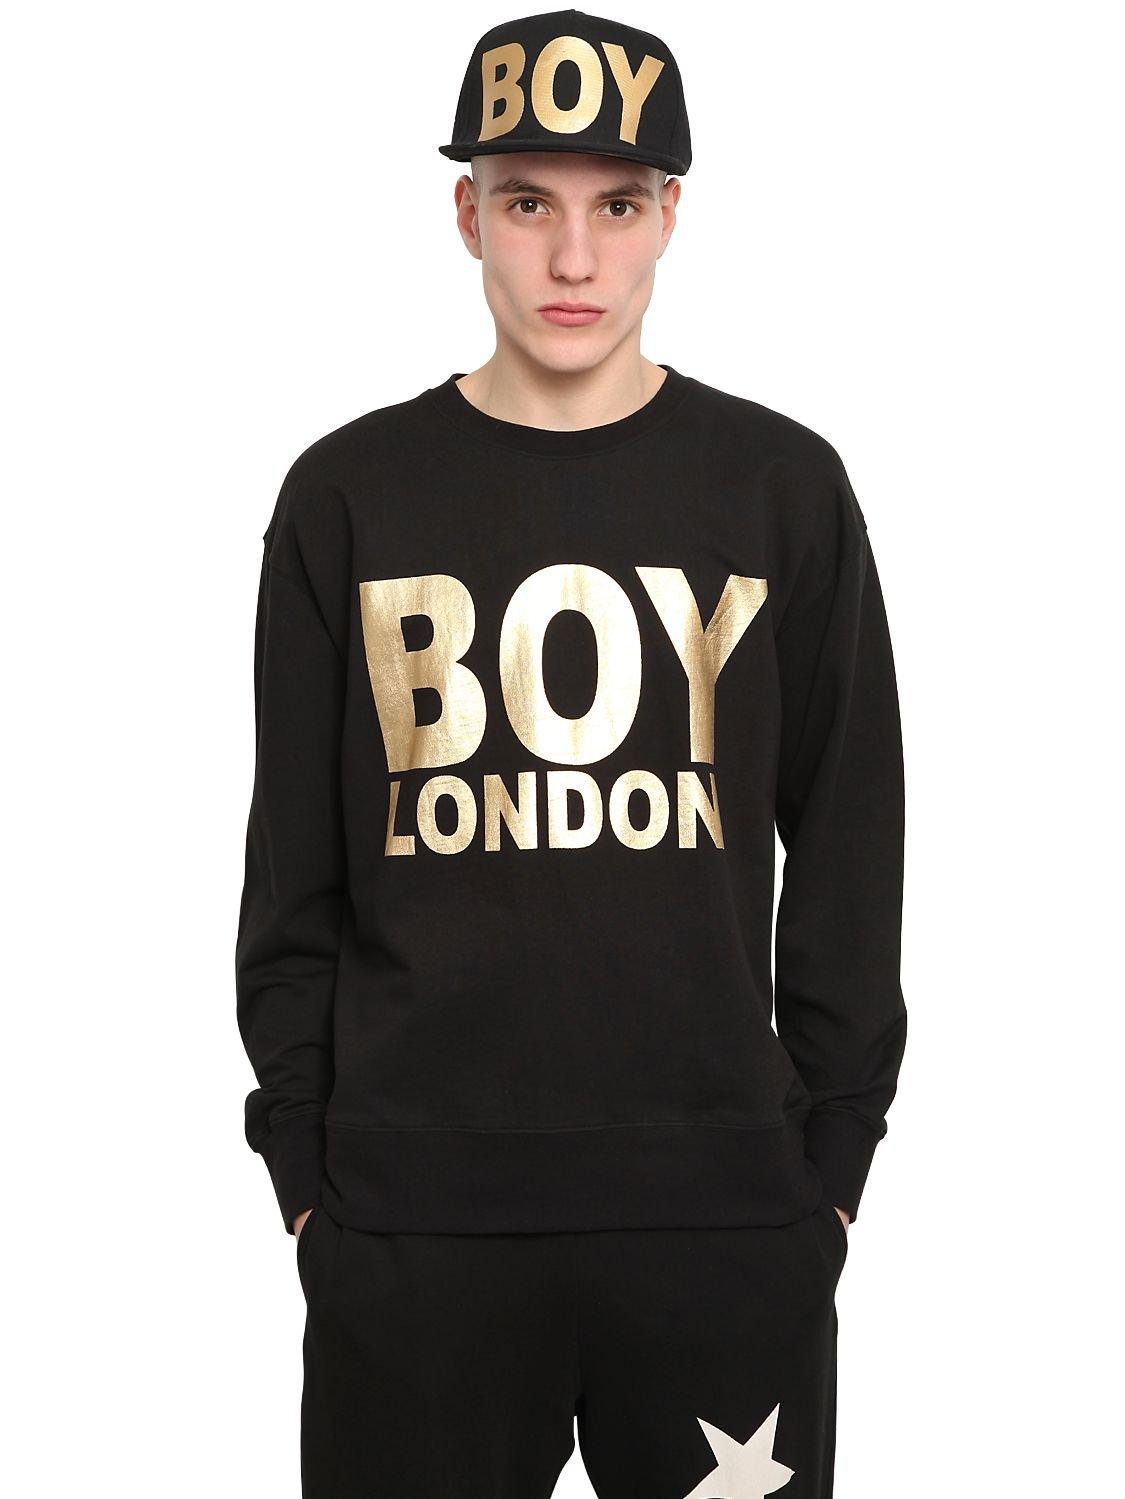 London boy clothing store